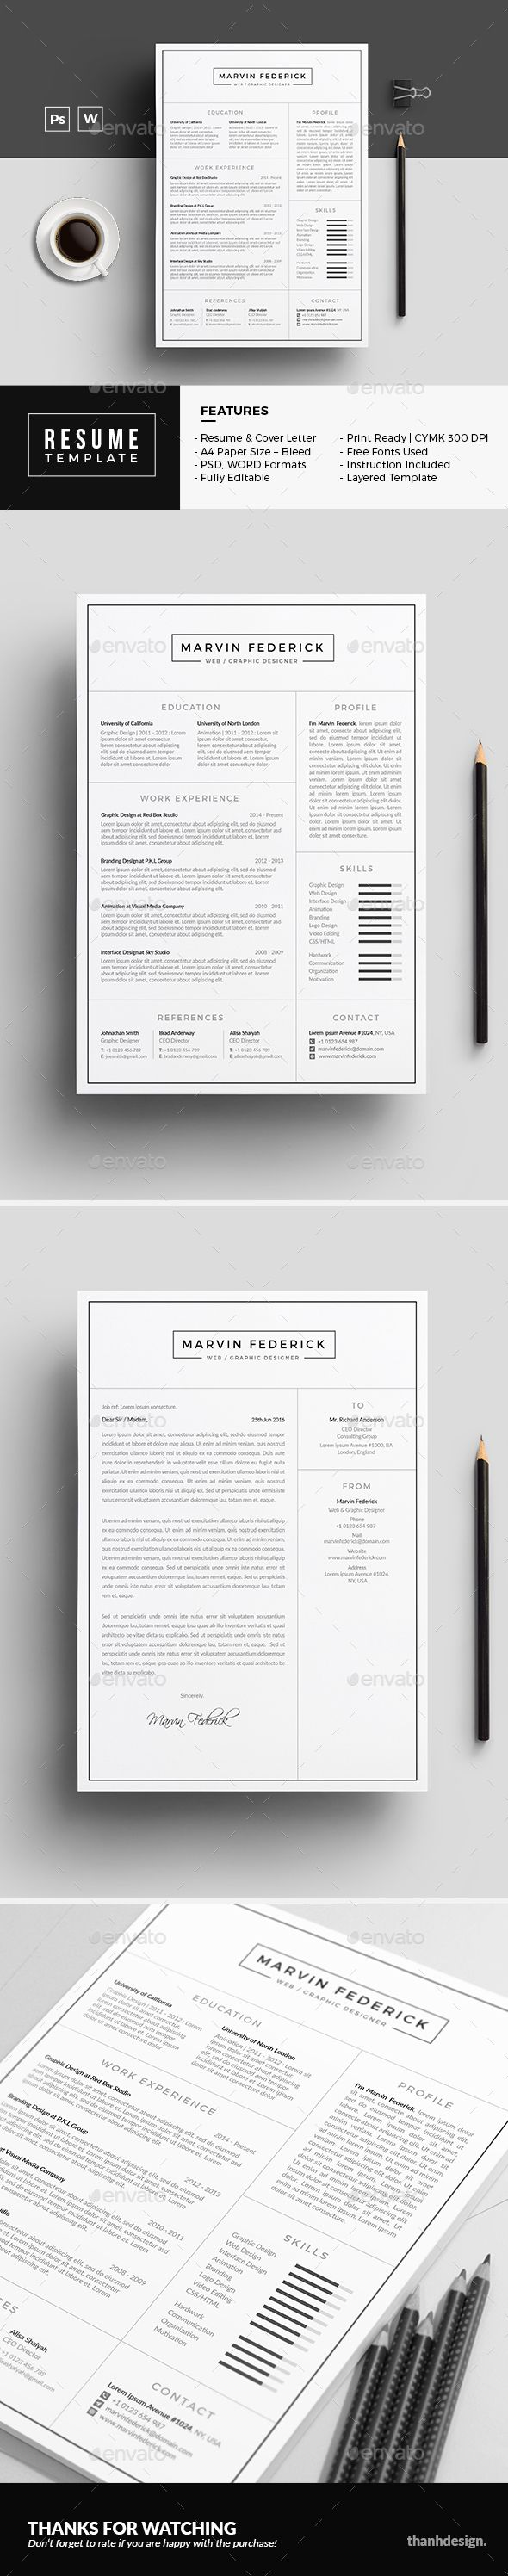 Write Custom Analysis Essay On Lincoln Impressive Resume Examples